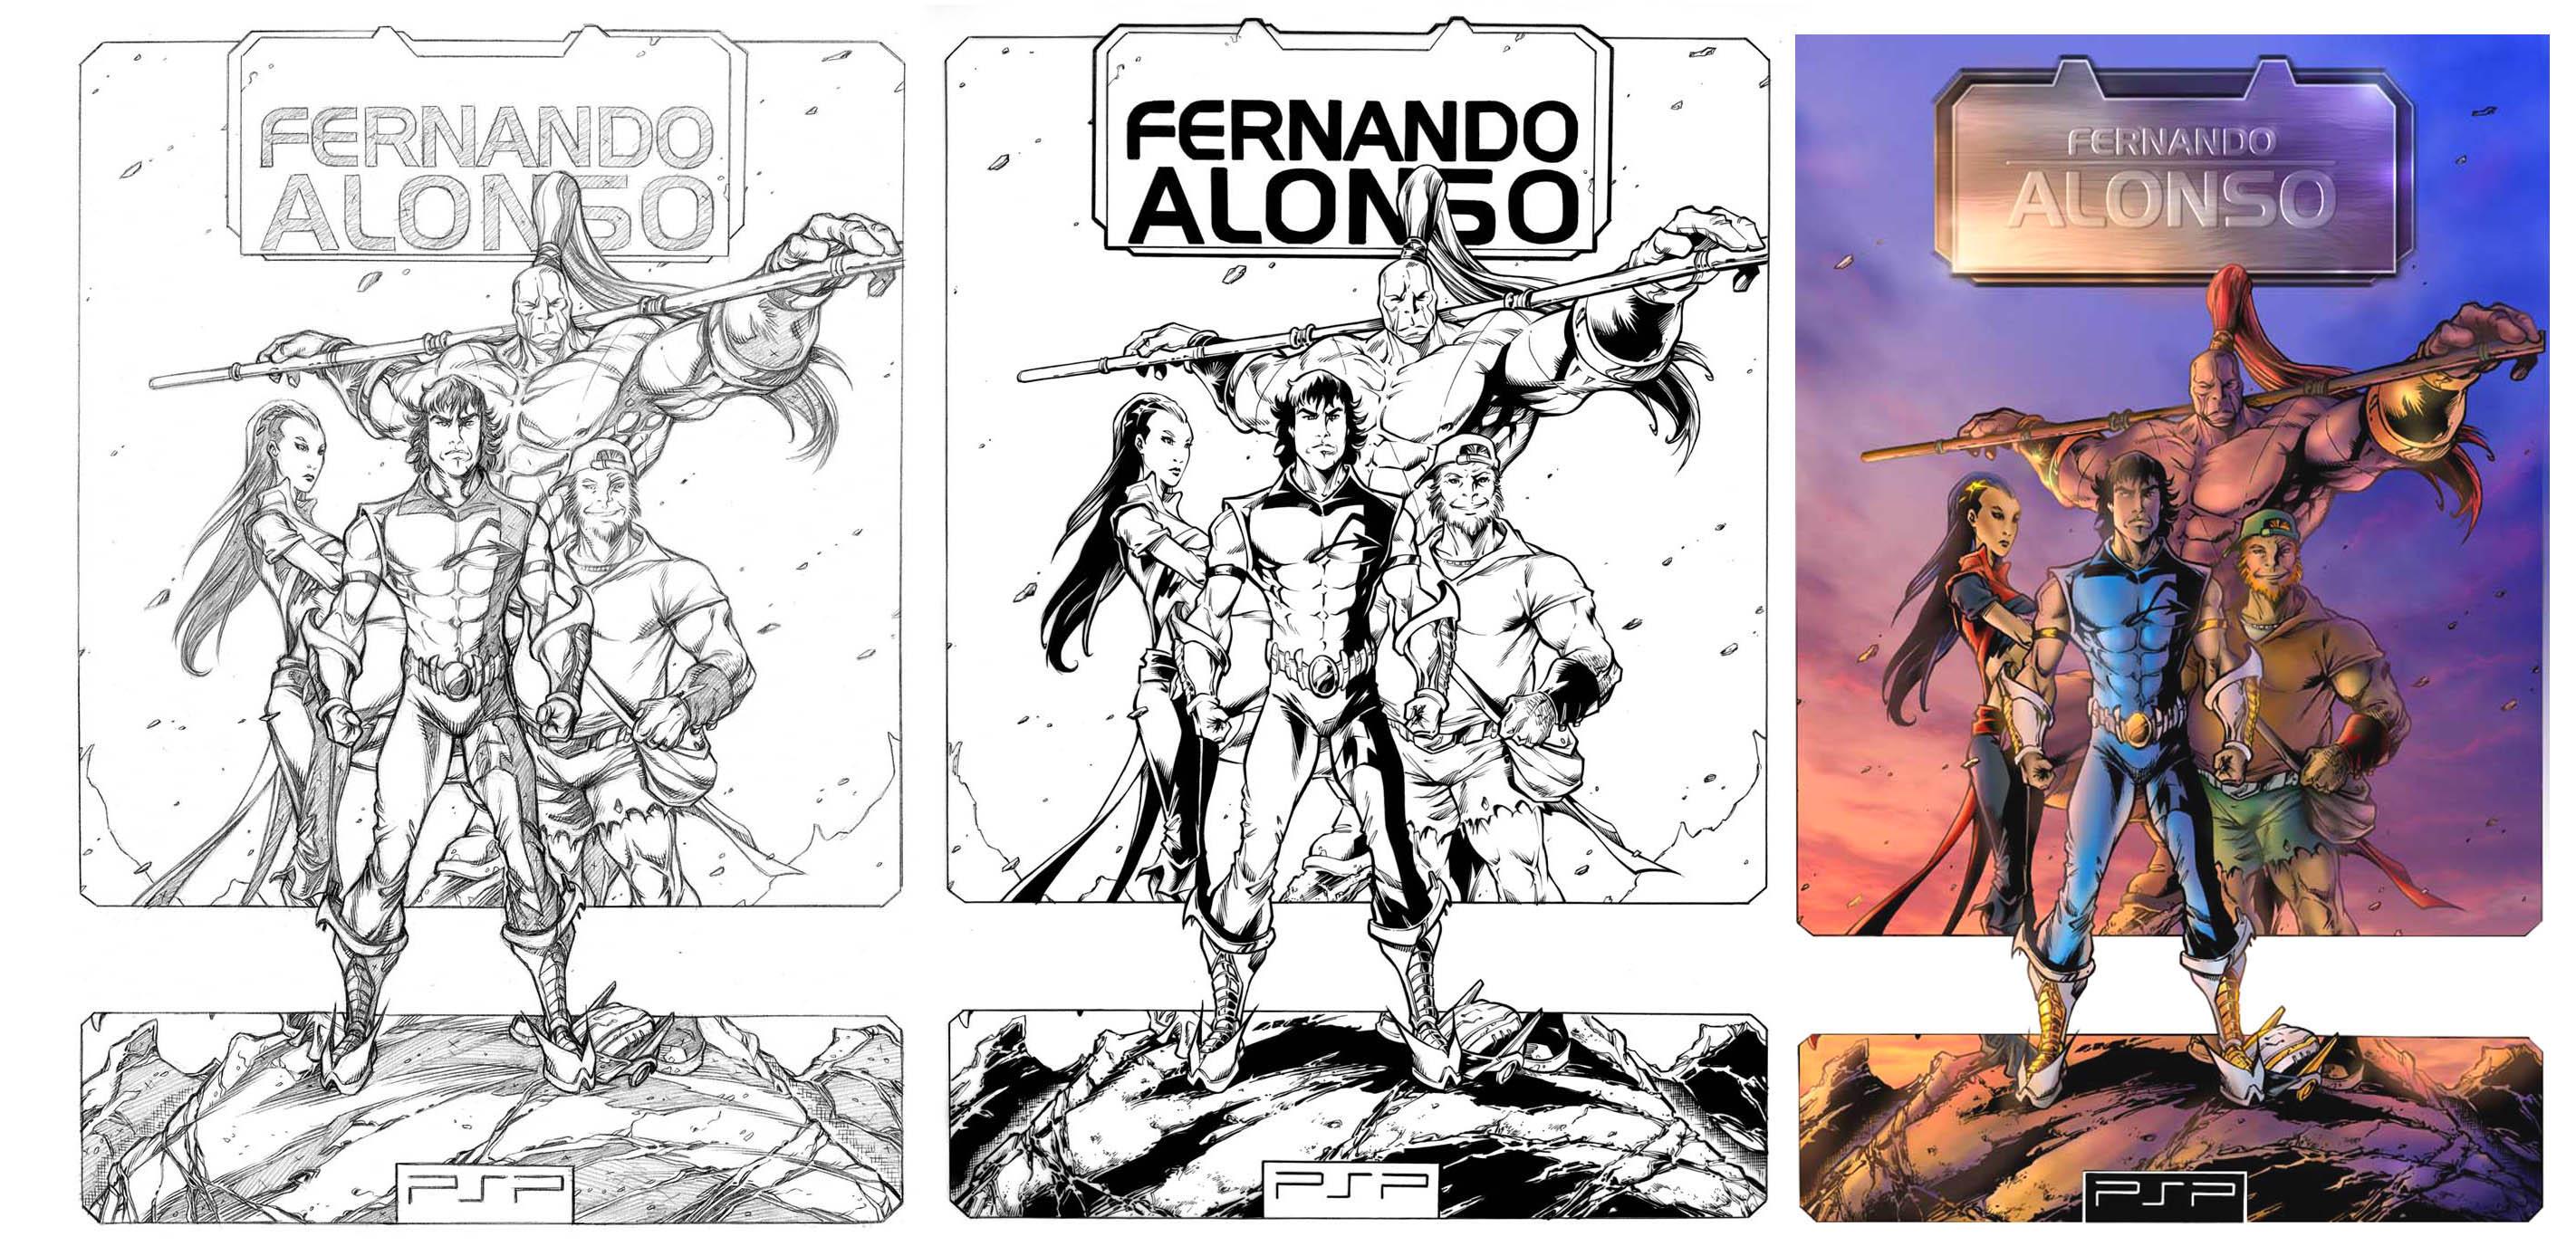 [Imagen: Fernando_Alonso_Comic_Cover1_by_airold.j...nq_26fdgcQ]